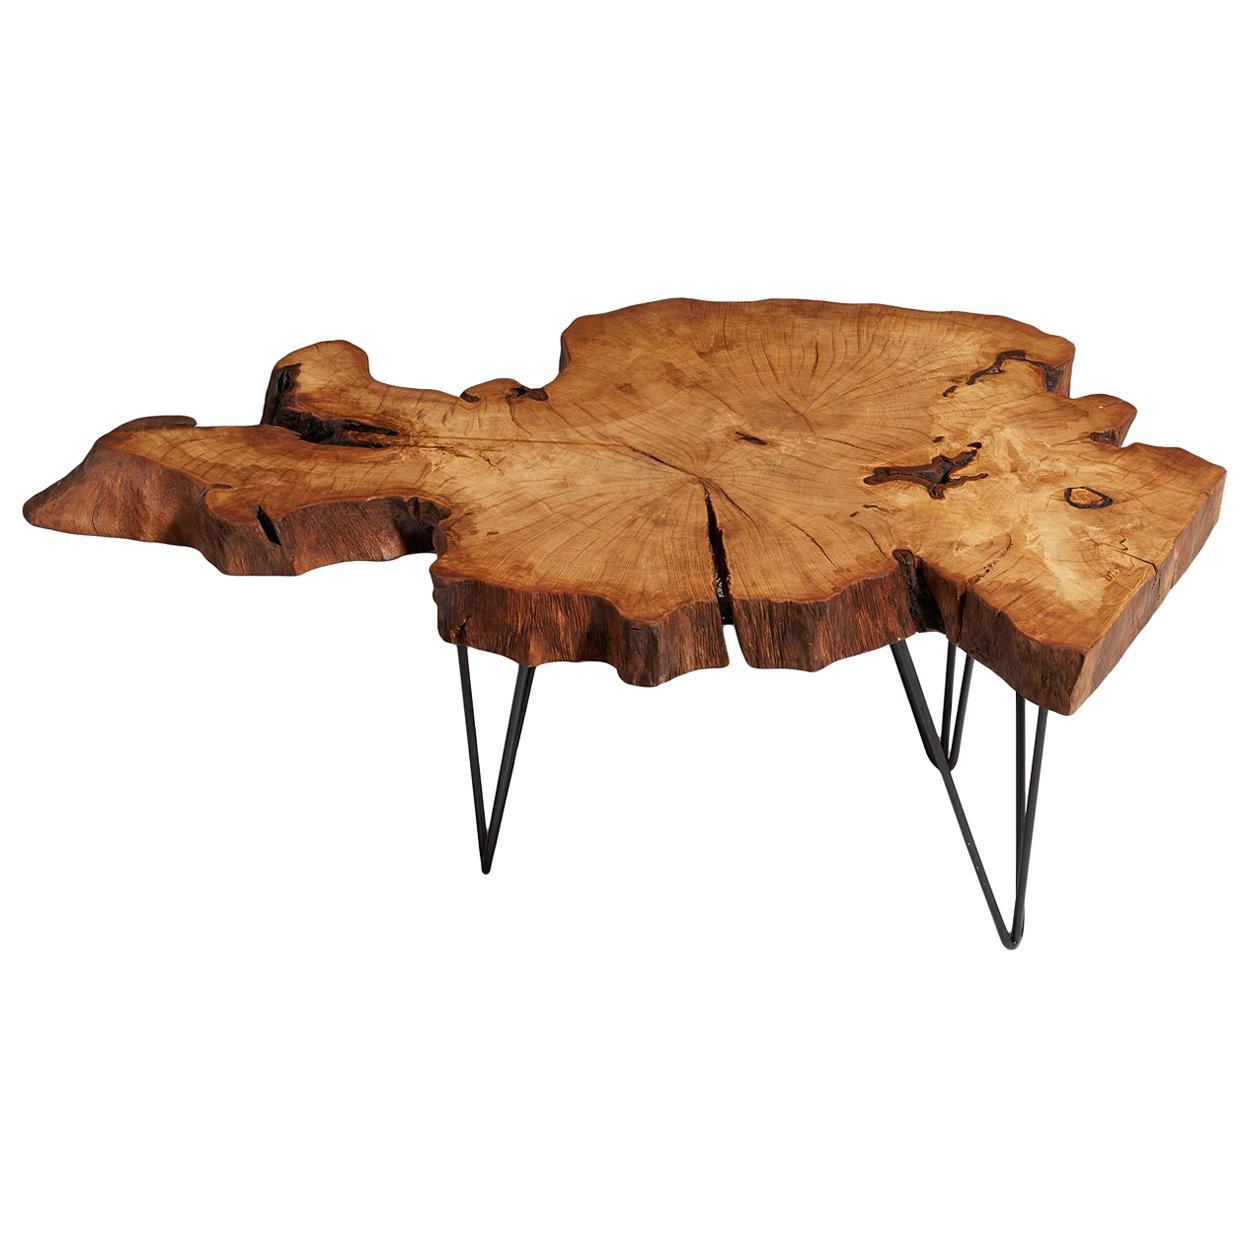 Hornbean Tree Live Edge Coffee Table, Live Edge Table, Rustic Edge End Table